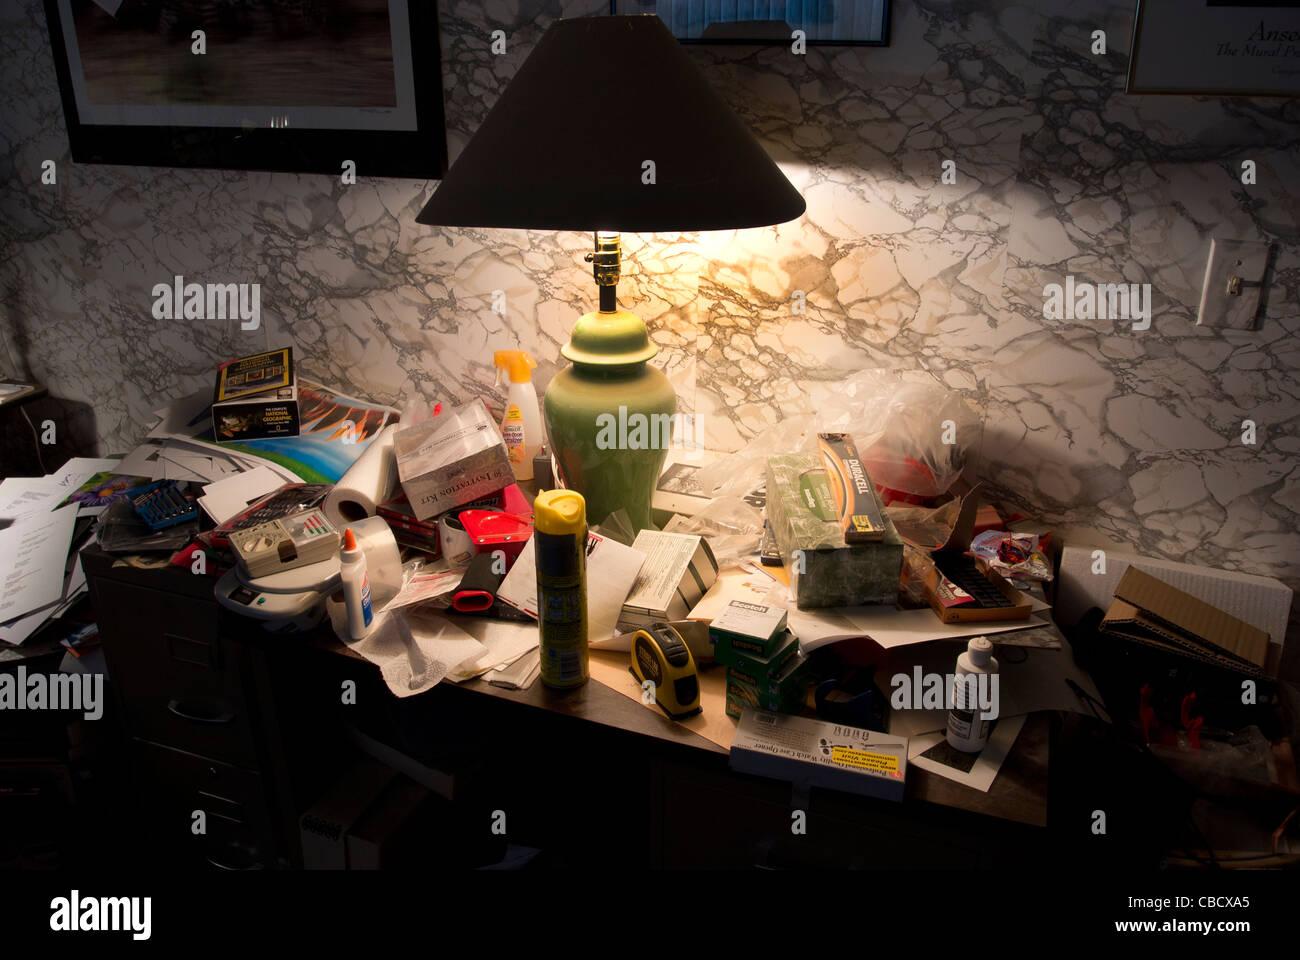 Very messy desk. - Stock Image